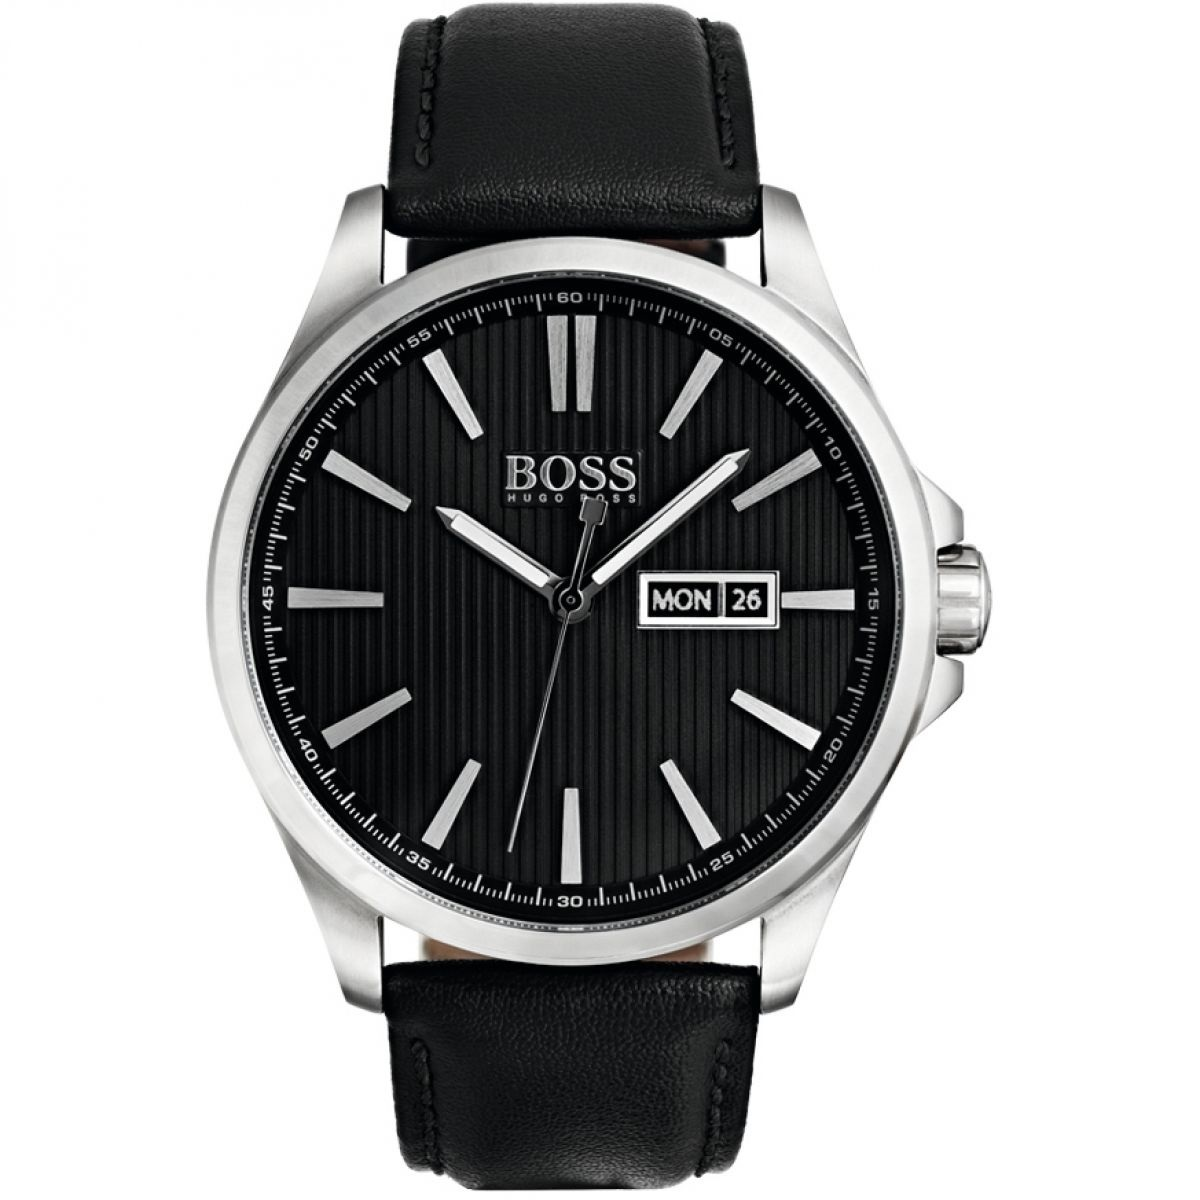 7ff31f134d ΡΟΛΟΪ Hugo Boss 1513464 ΑΝΔΡΙΚΑ ΡΟΛΟΓΙΑ